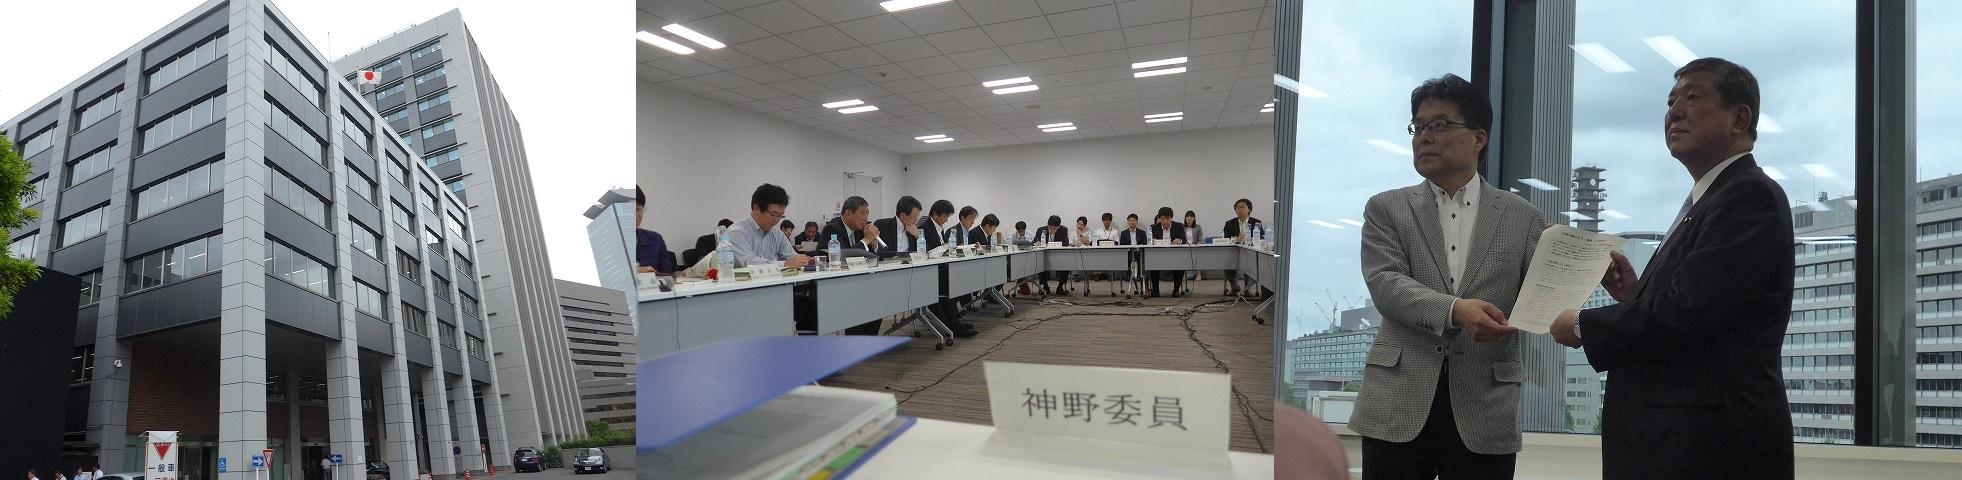 日本版CCRC構想中間報告と医療事故調査制度に係る指針_b0115629_21285737.jpg